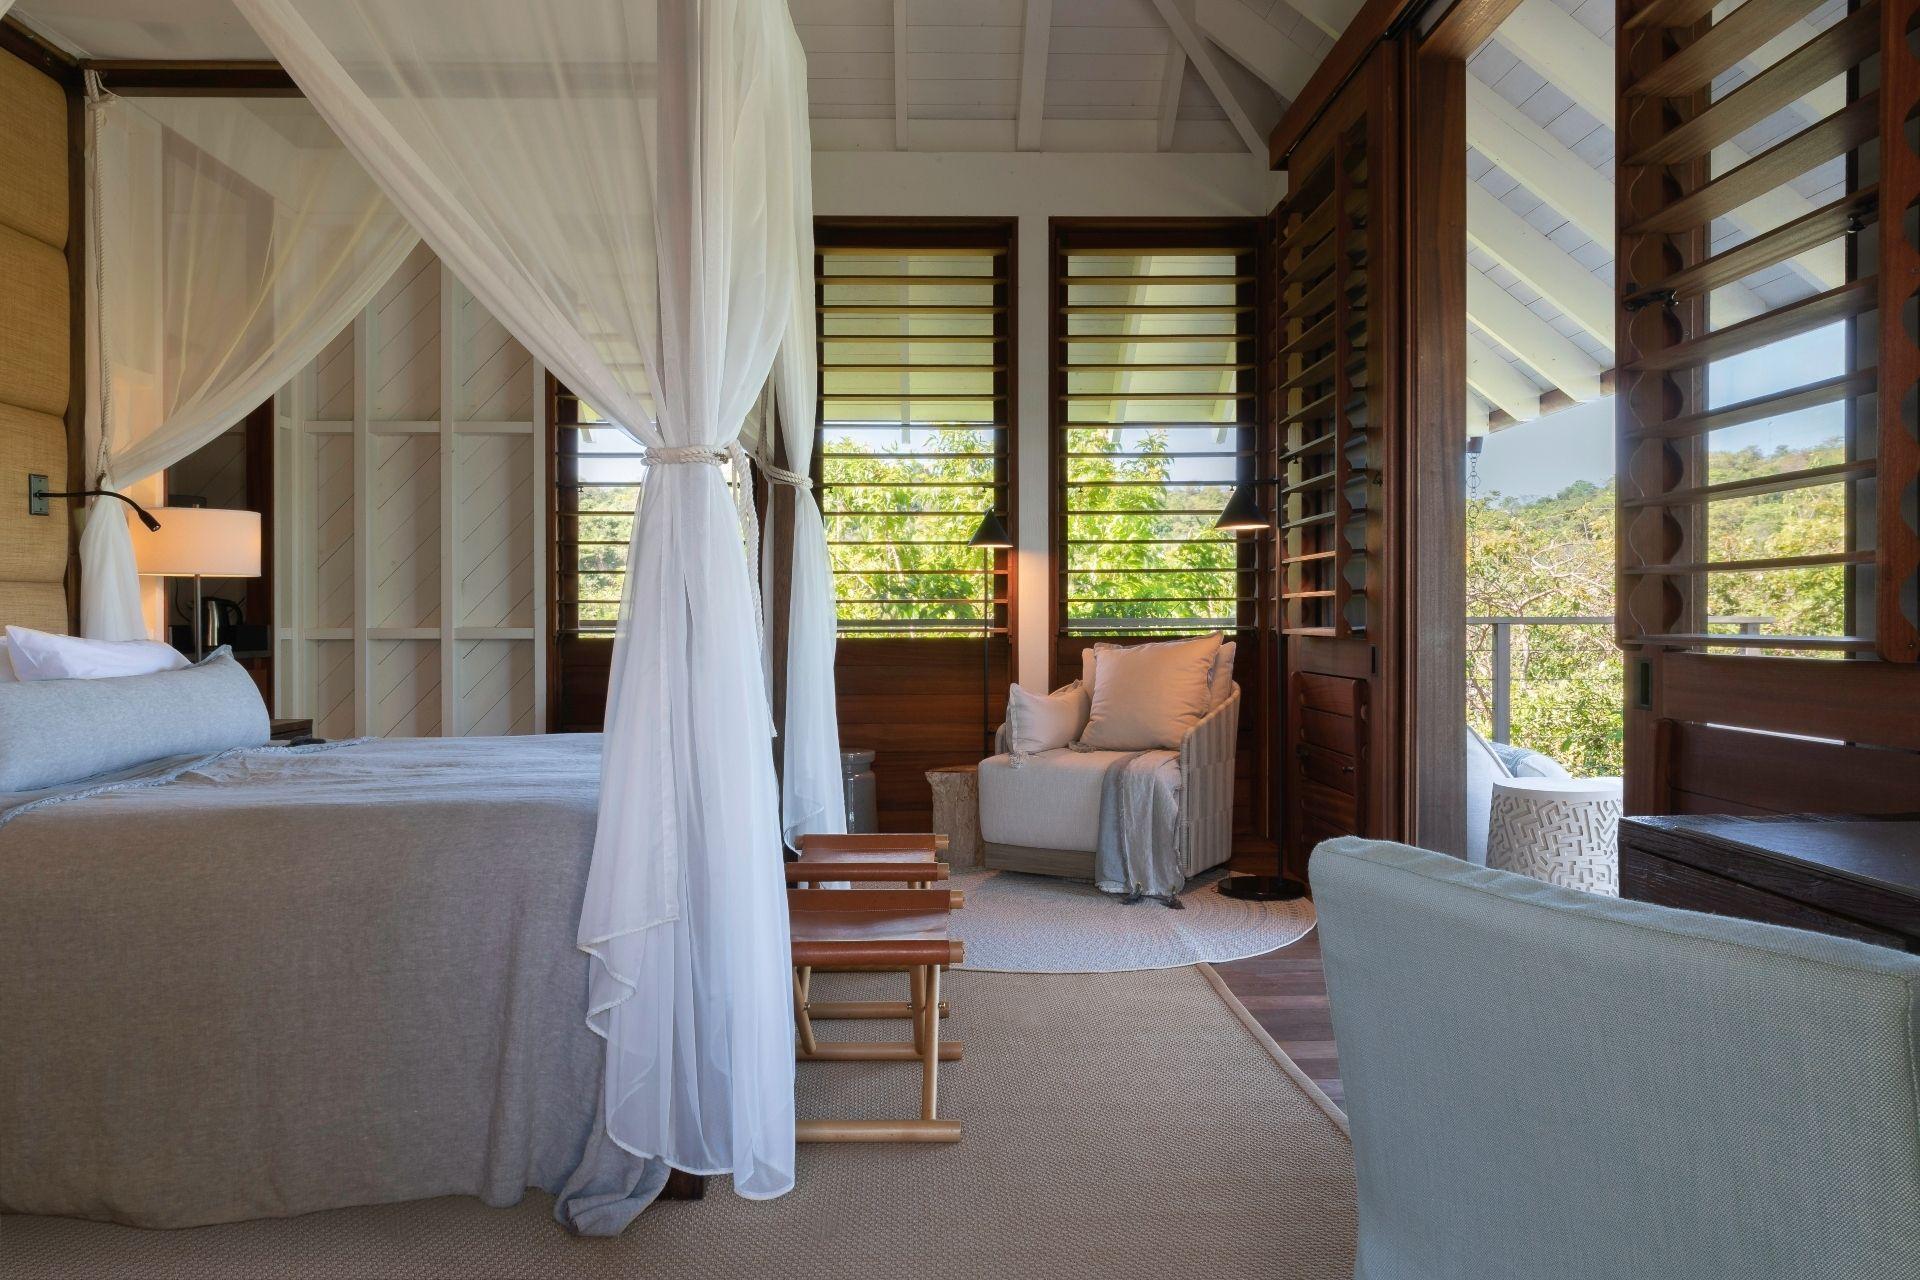 Move_Mountains_Luxury_Holidays_Sustainable_Americas_Panama_Islas_Secas_typical_double_decor